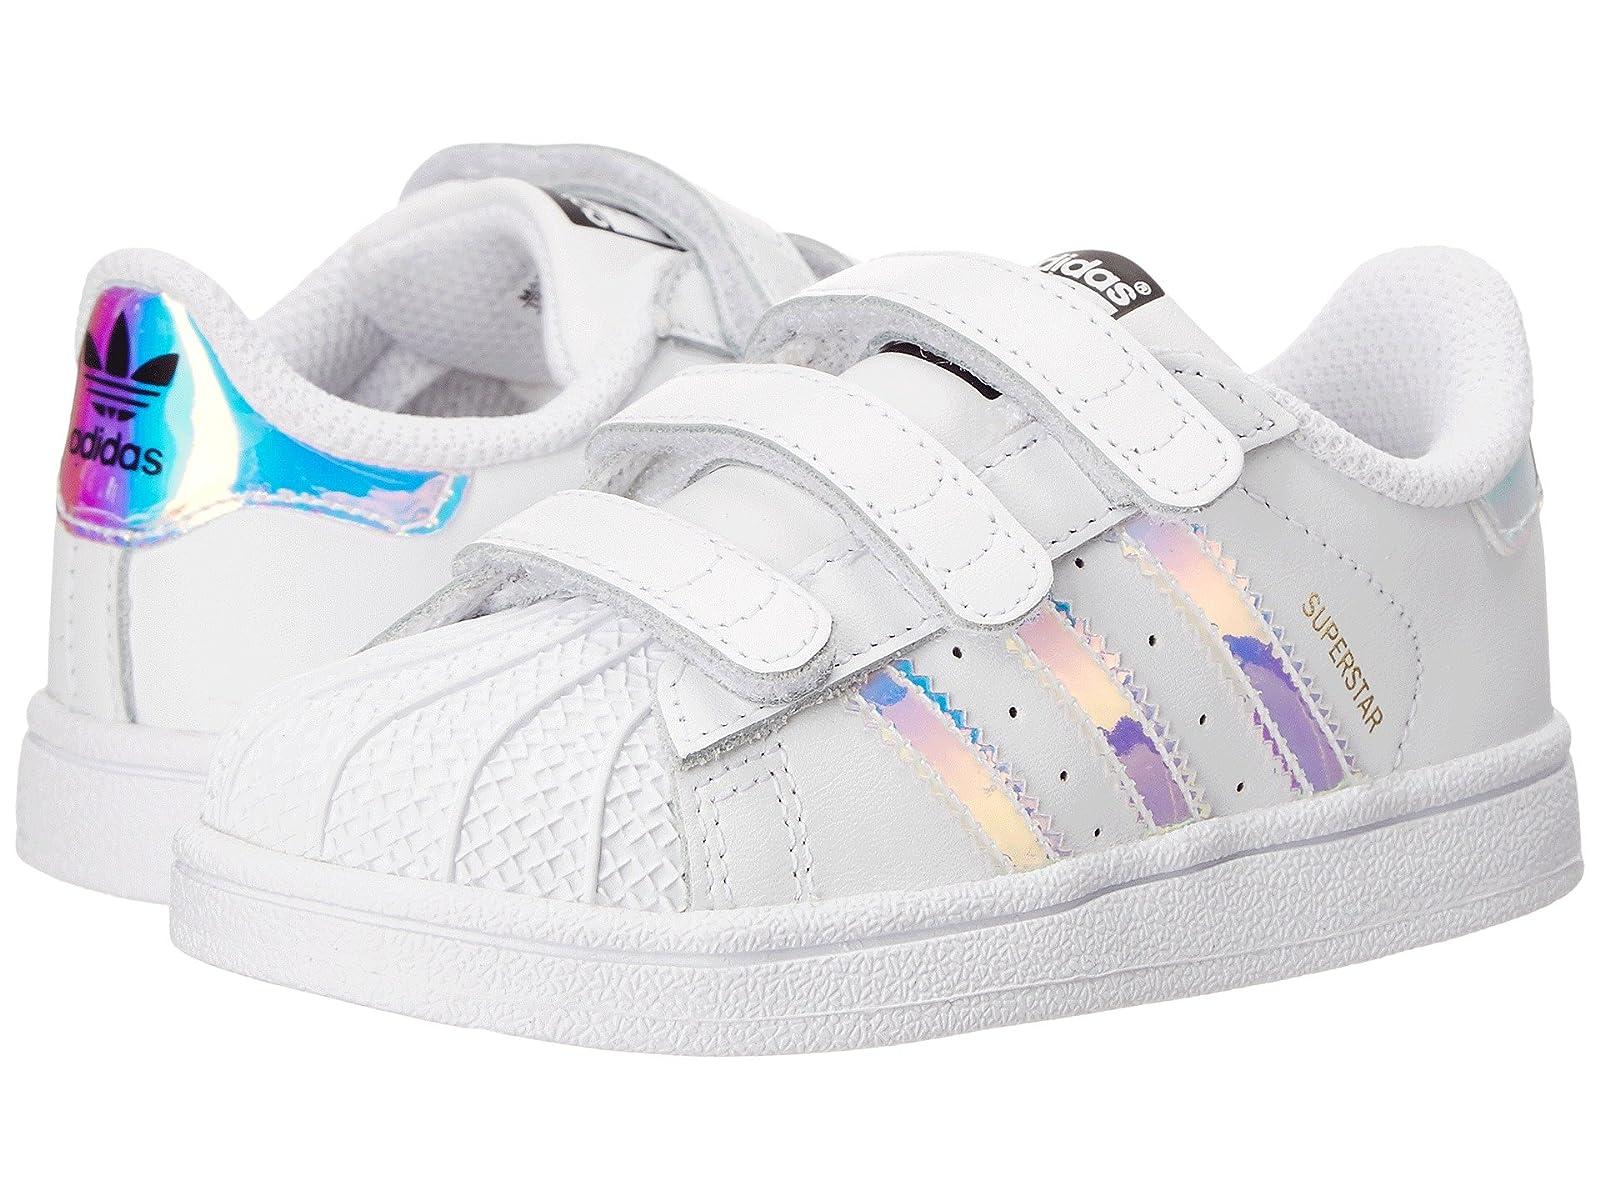 adidas Originals Kids Superstar Metallic CMF INF (Toddler)Atmospheric grades have affordable shoes